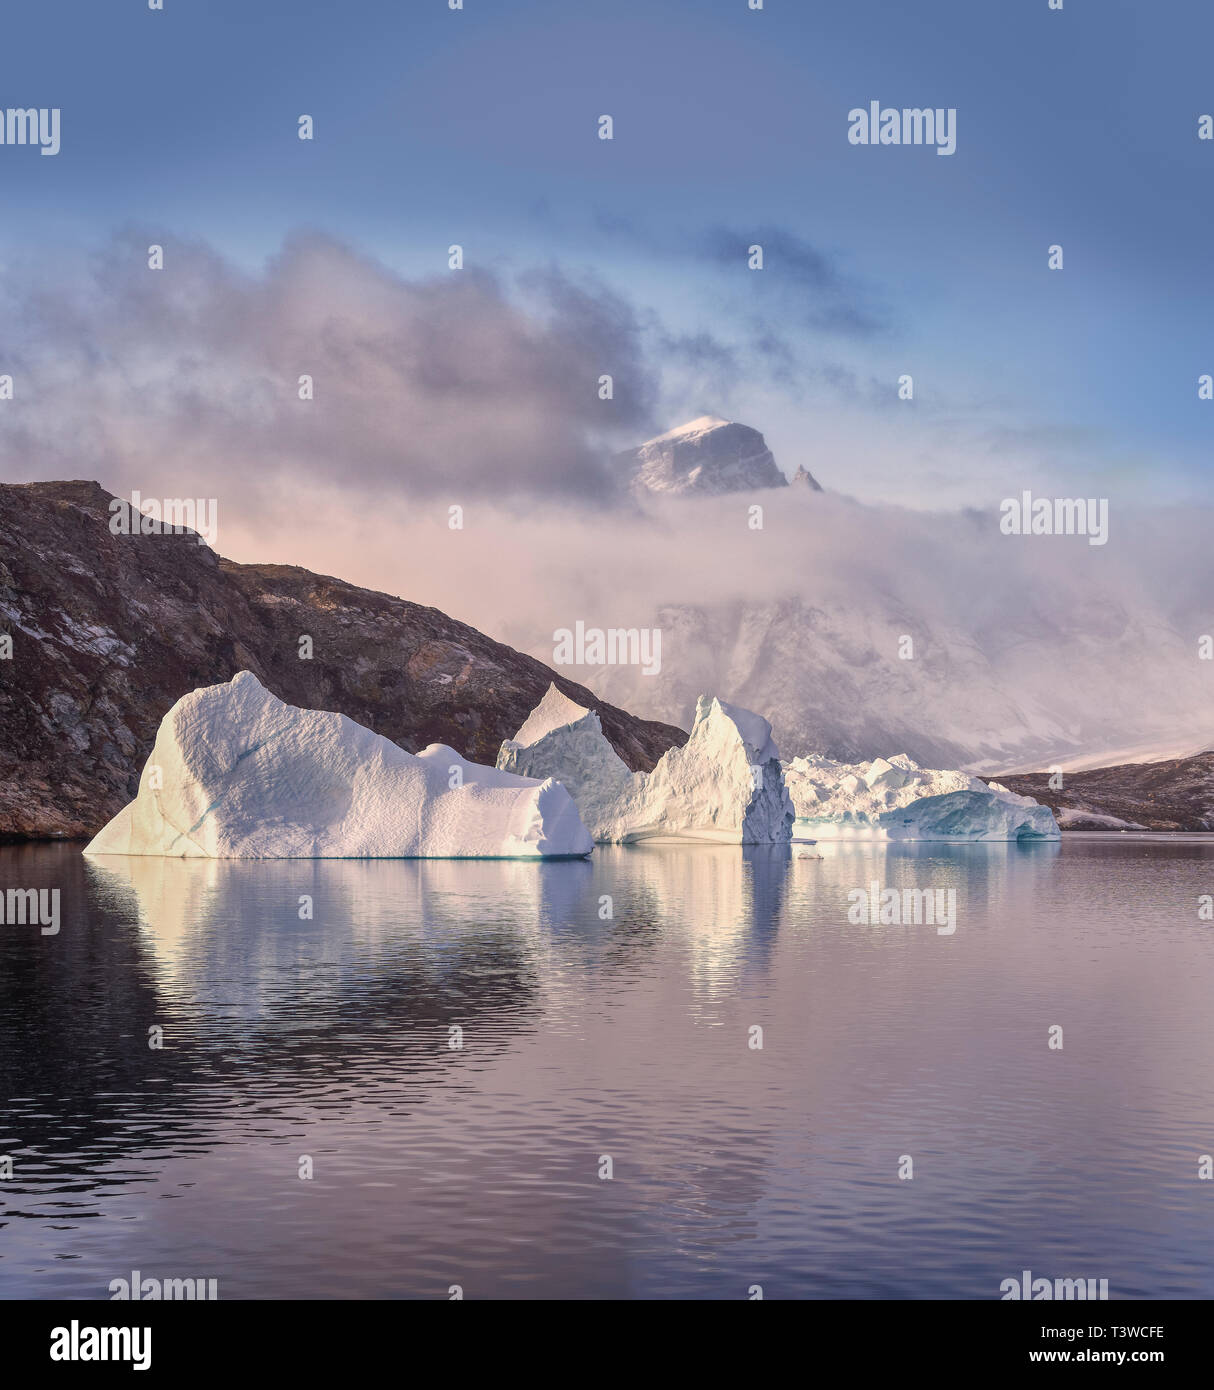 Los icebergs, Scoresbysund, Groenlandia Foto de stock